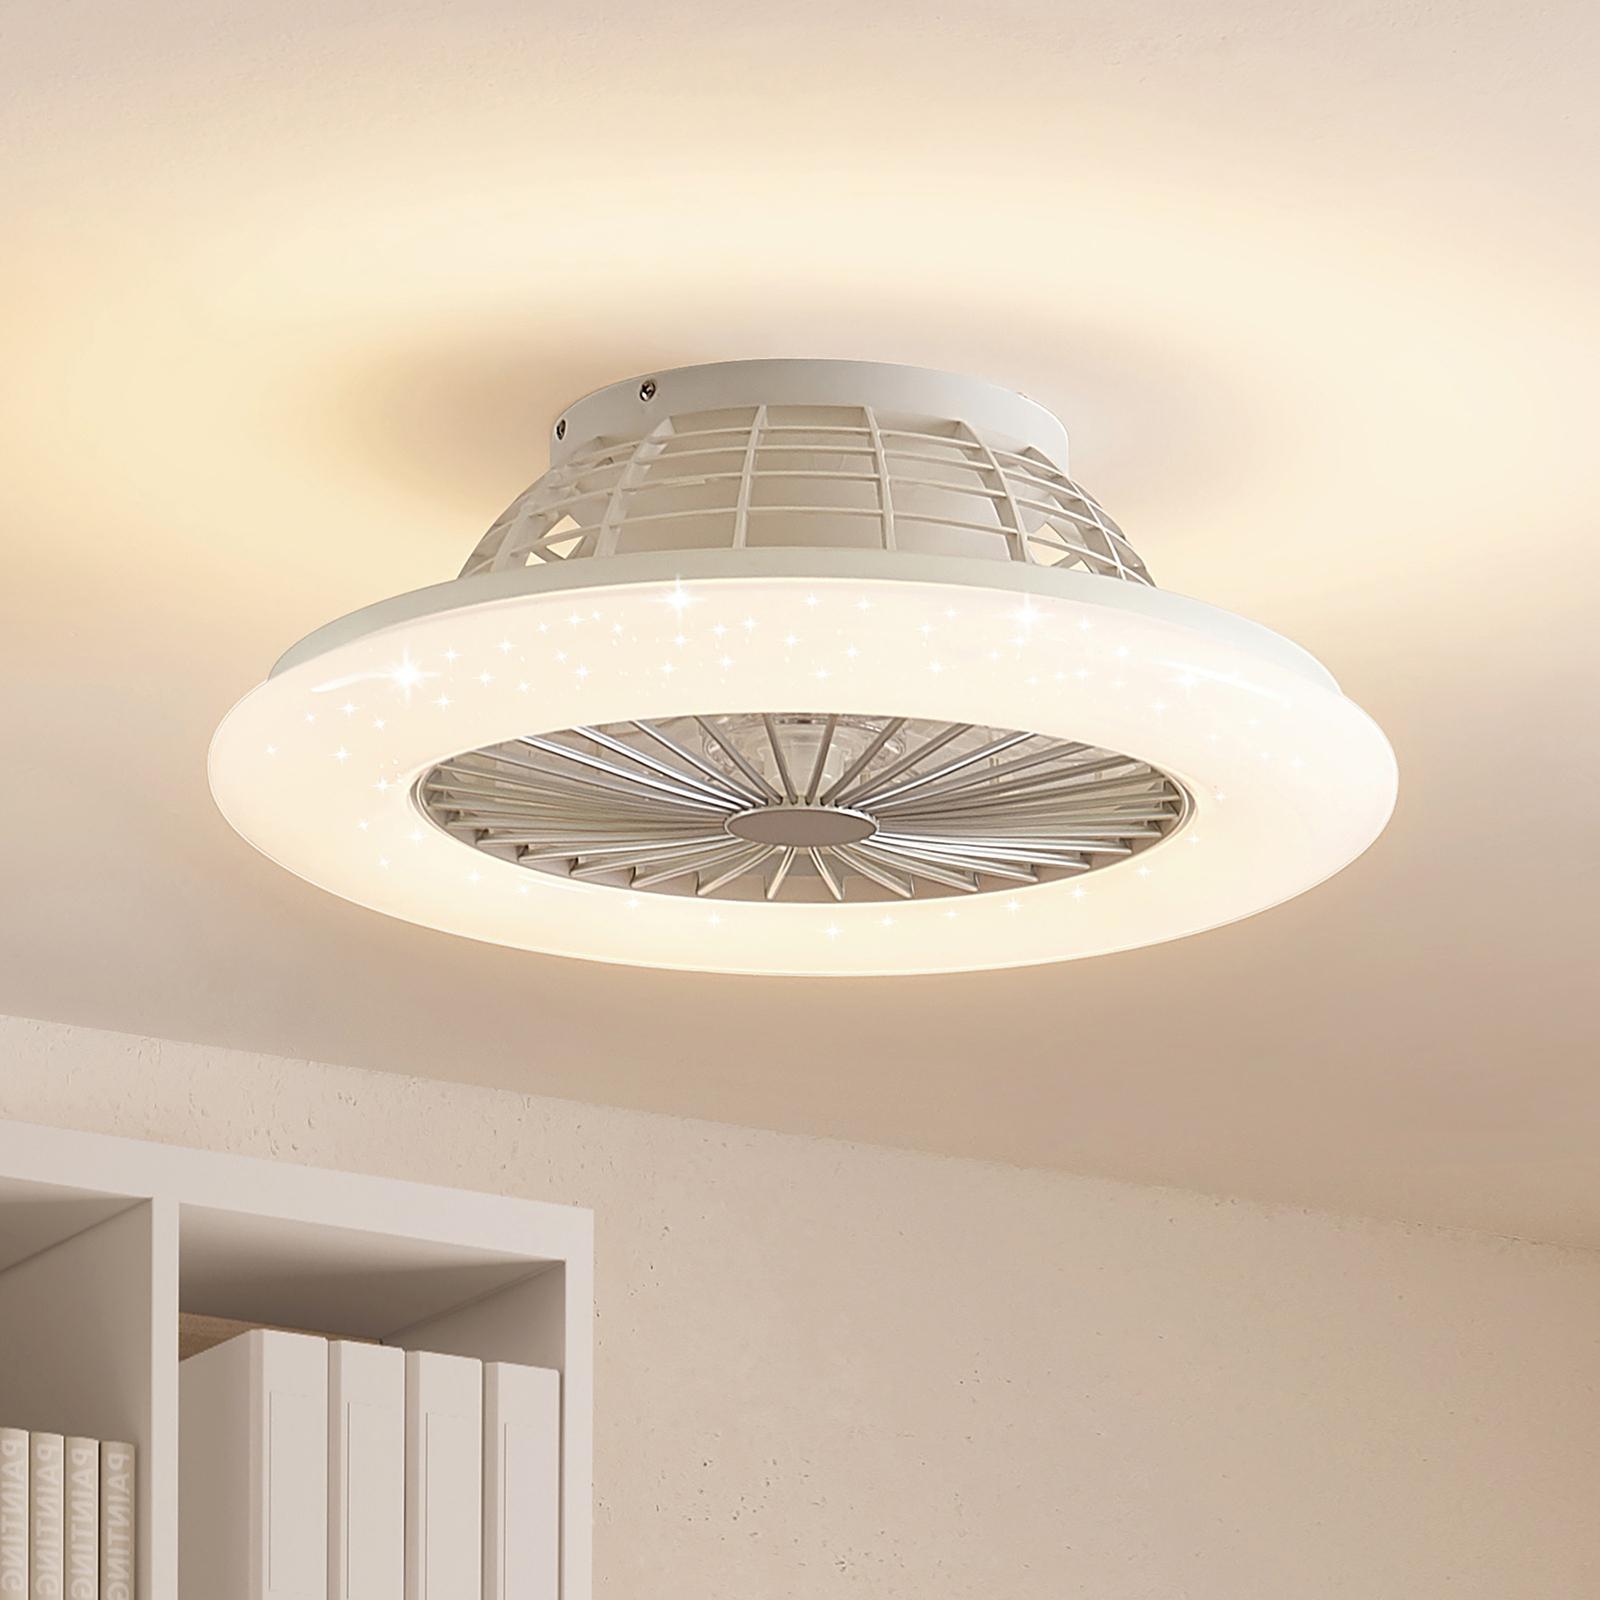 Starluna Taloni LED-Deckenventilator Beleuchtung